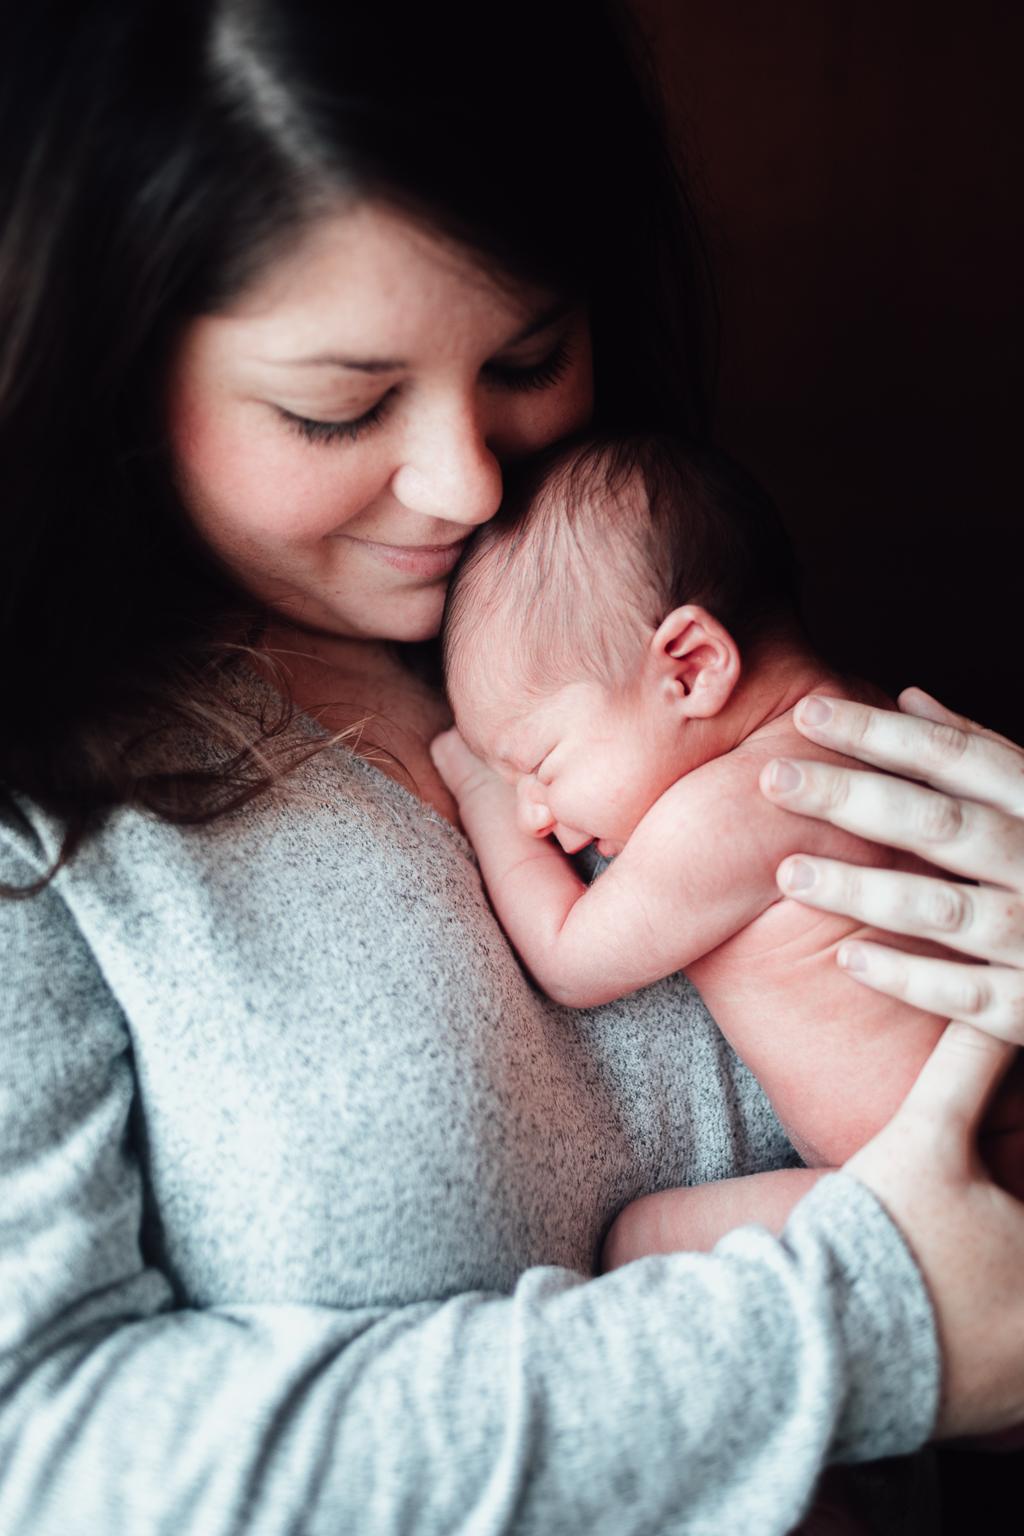 fotografo recién nacido Barcelona :: fotógrafo recién nacido Sant Cugat :: Fotógrafo LifeStyle :: Livestyle Barcelona :: Fotógrafo en casa :: fotógrafo de bebé sant cugat